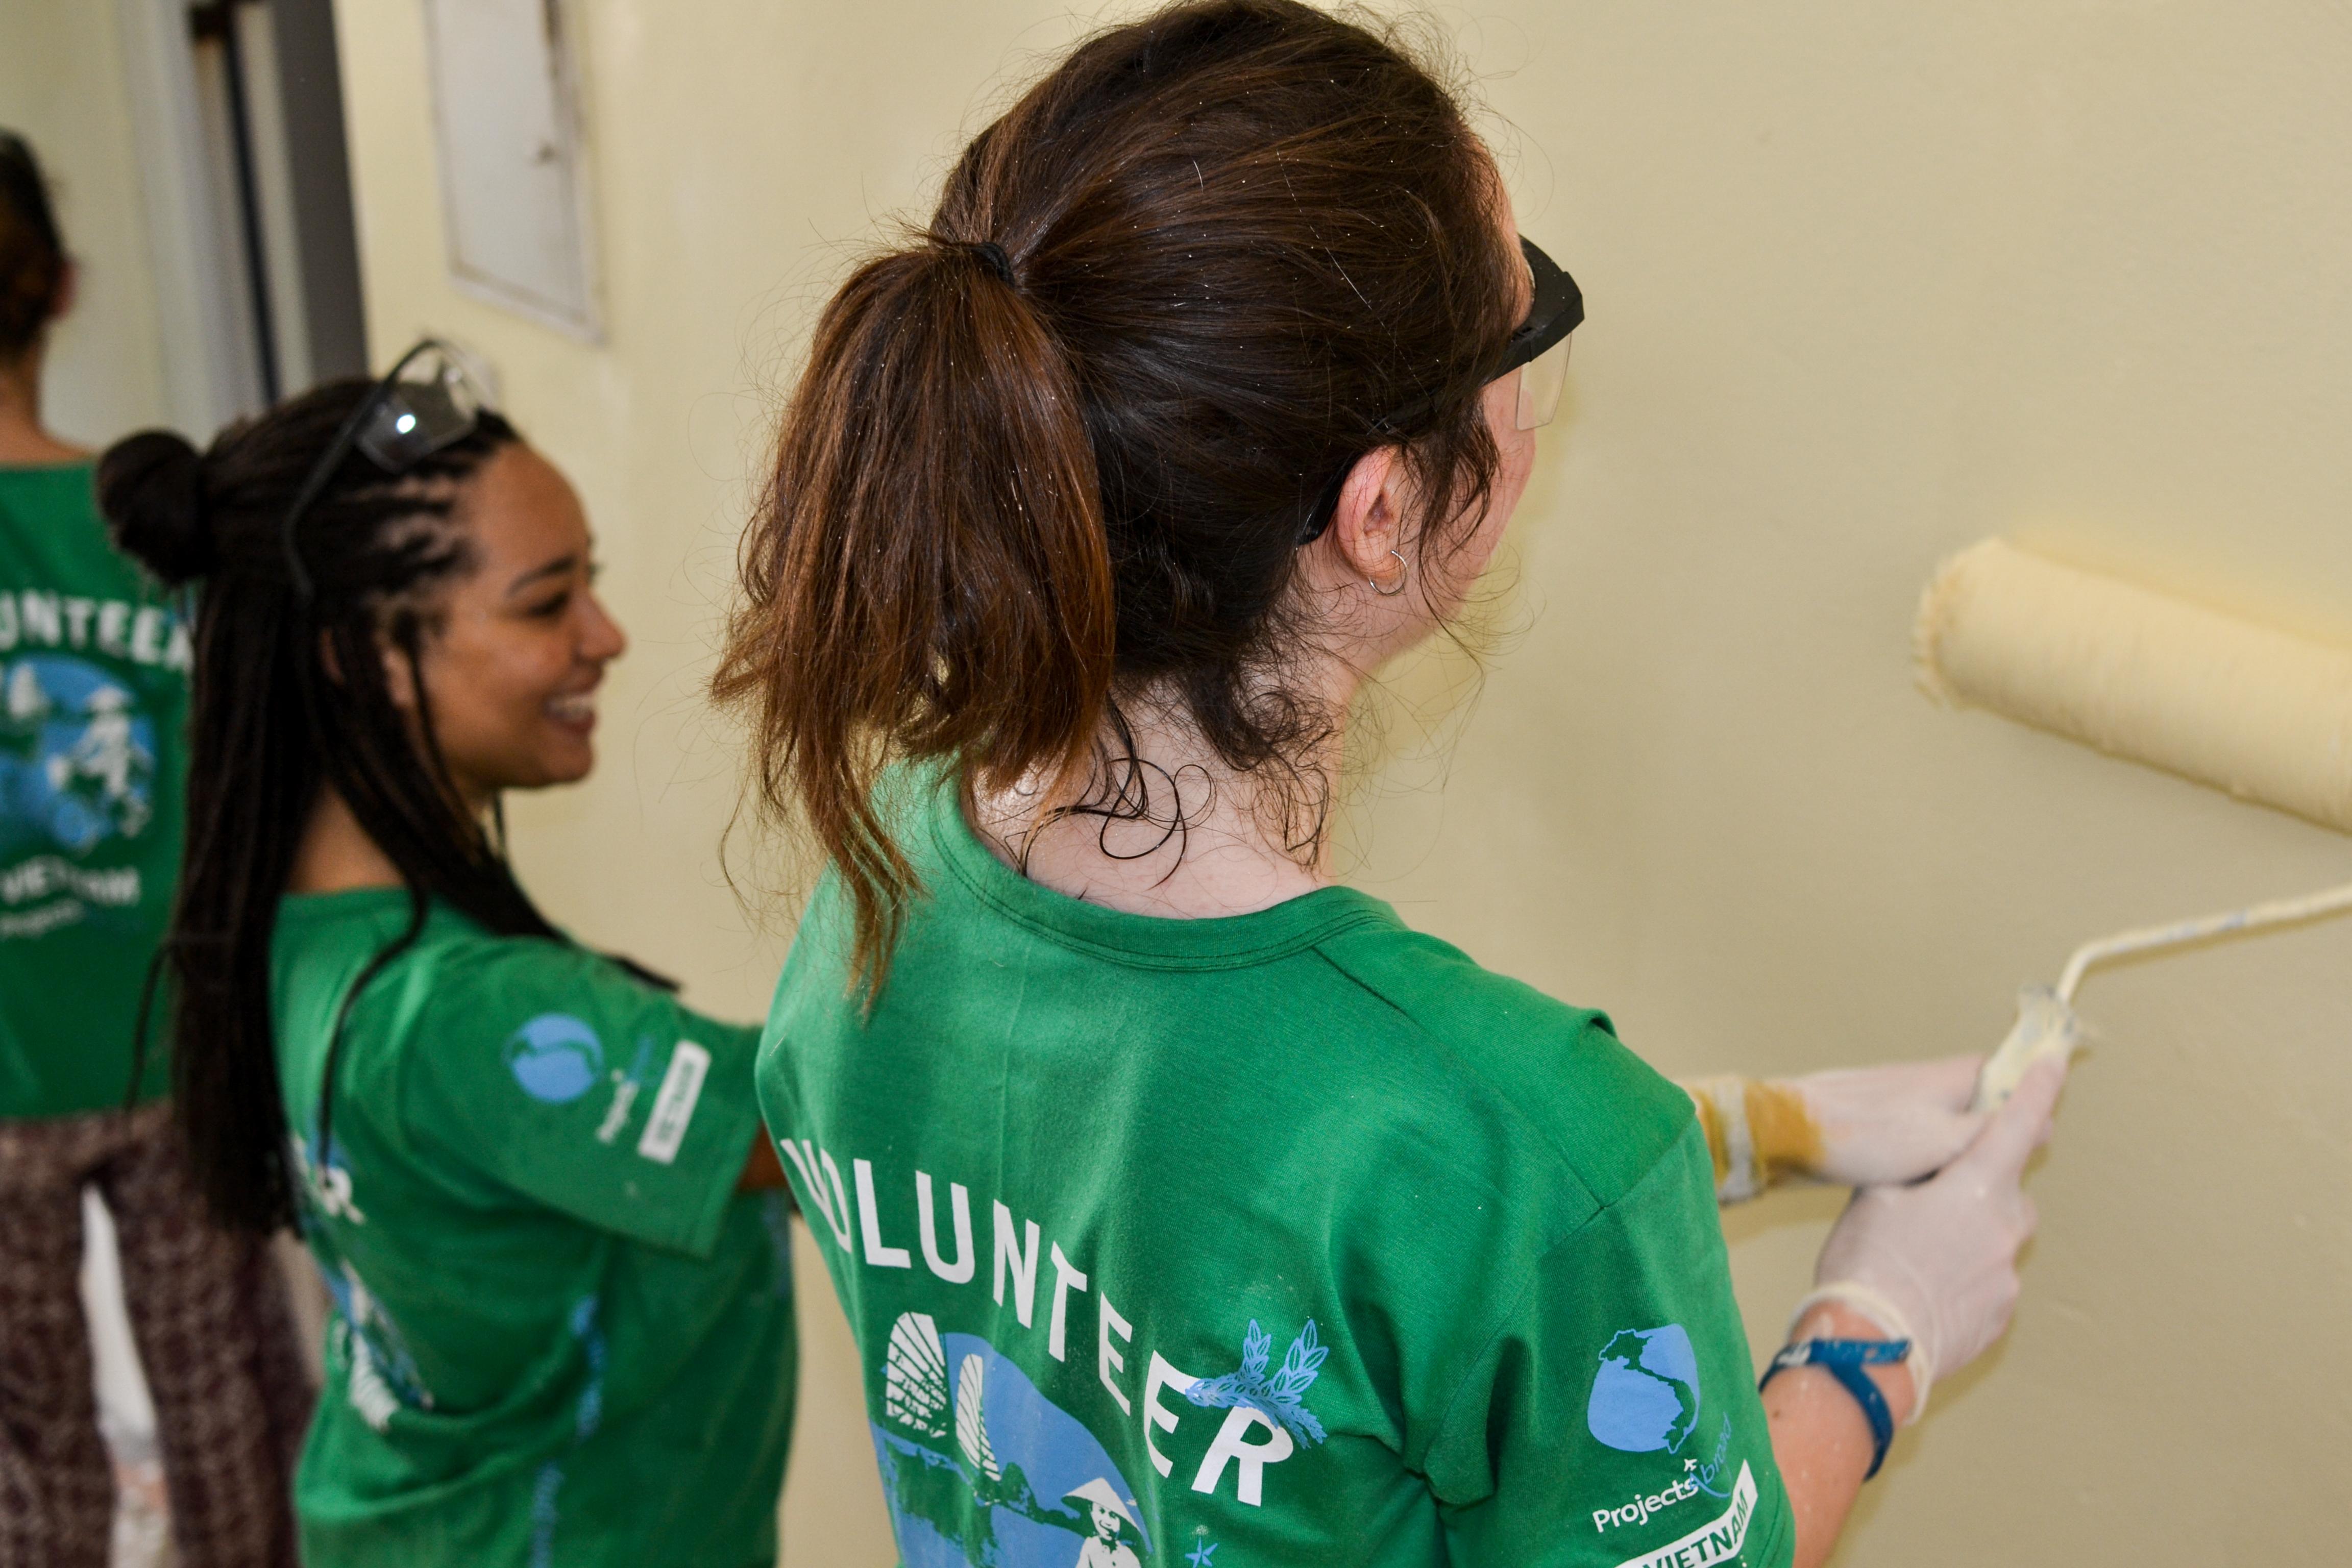 Gap Year Program - Projects Abroad: Gap Year Volunteering Abroad  10